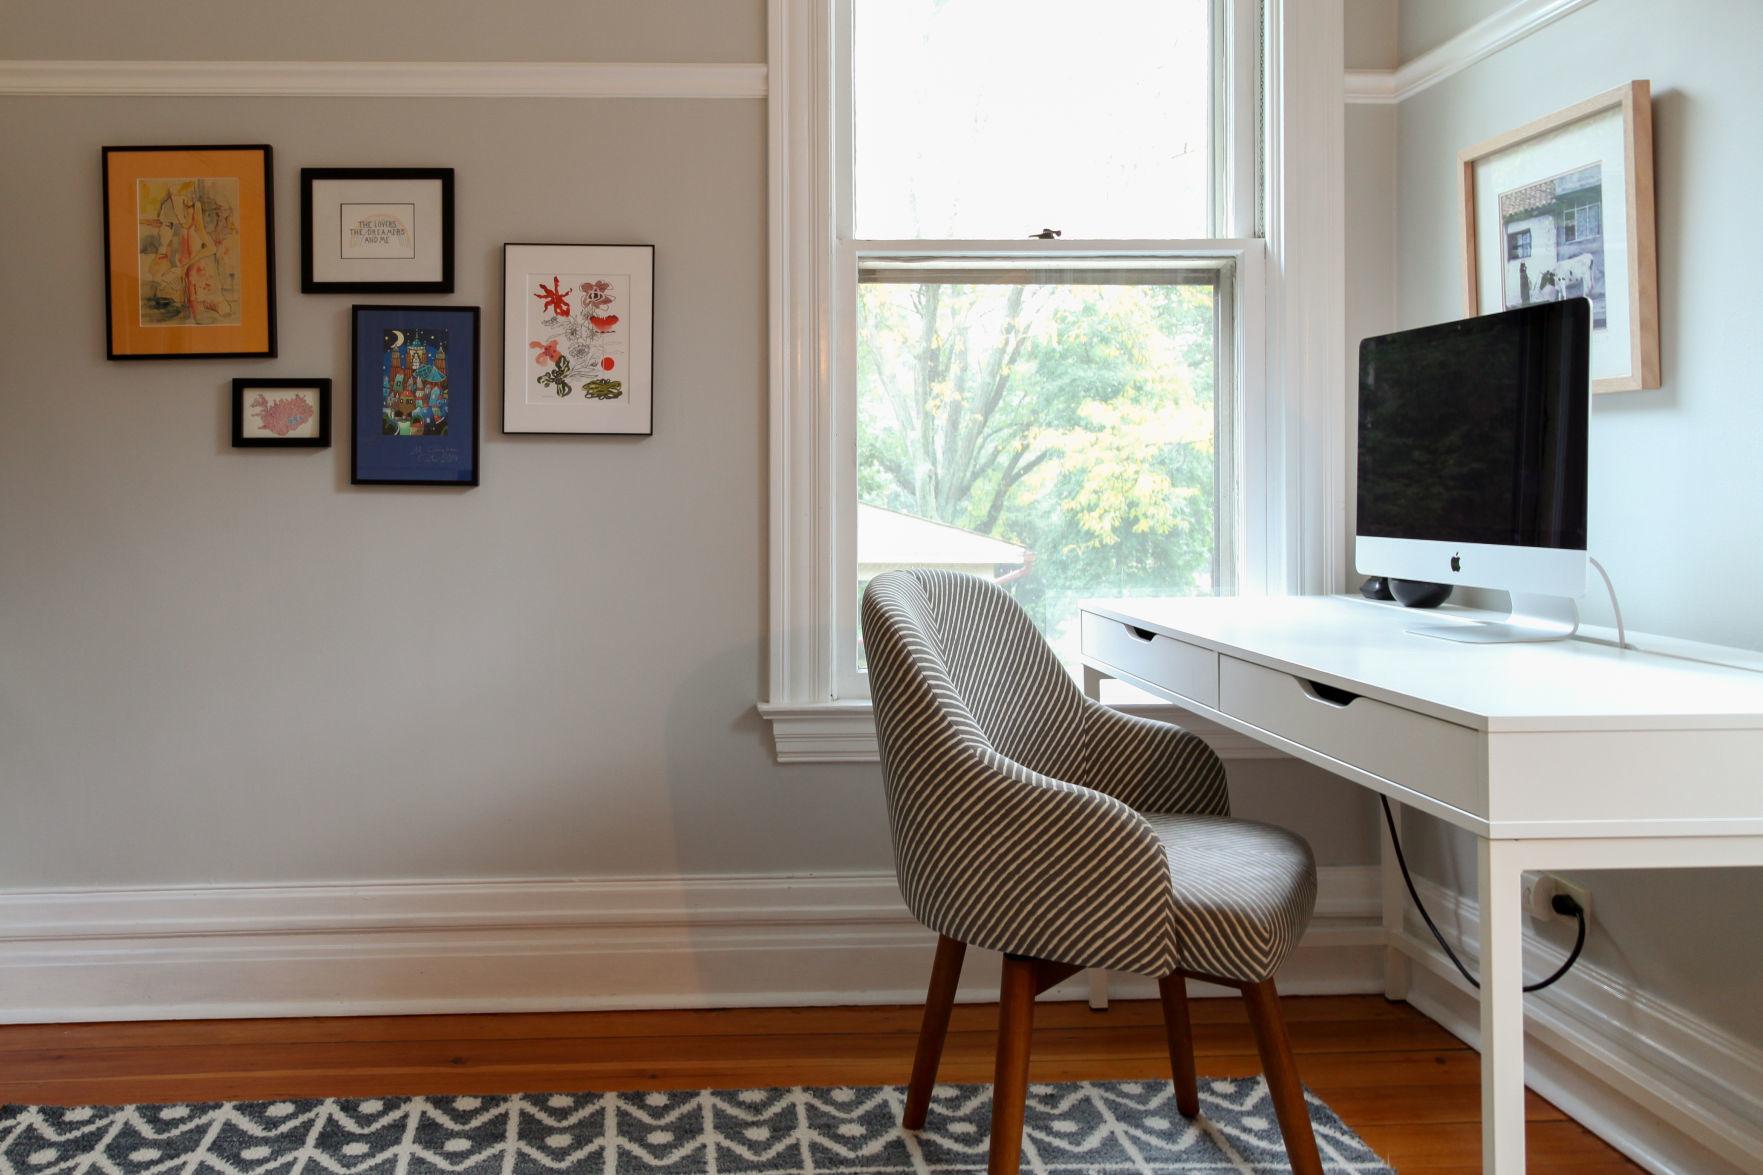 Home Office. Rachel Loewen Photography, Original Photo On Houzz